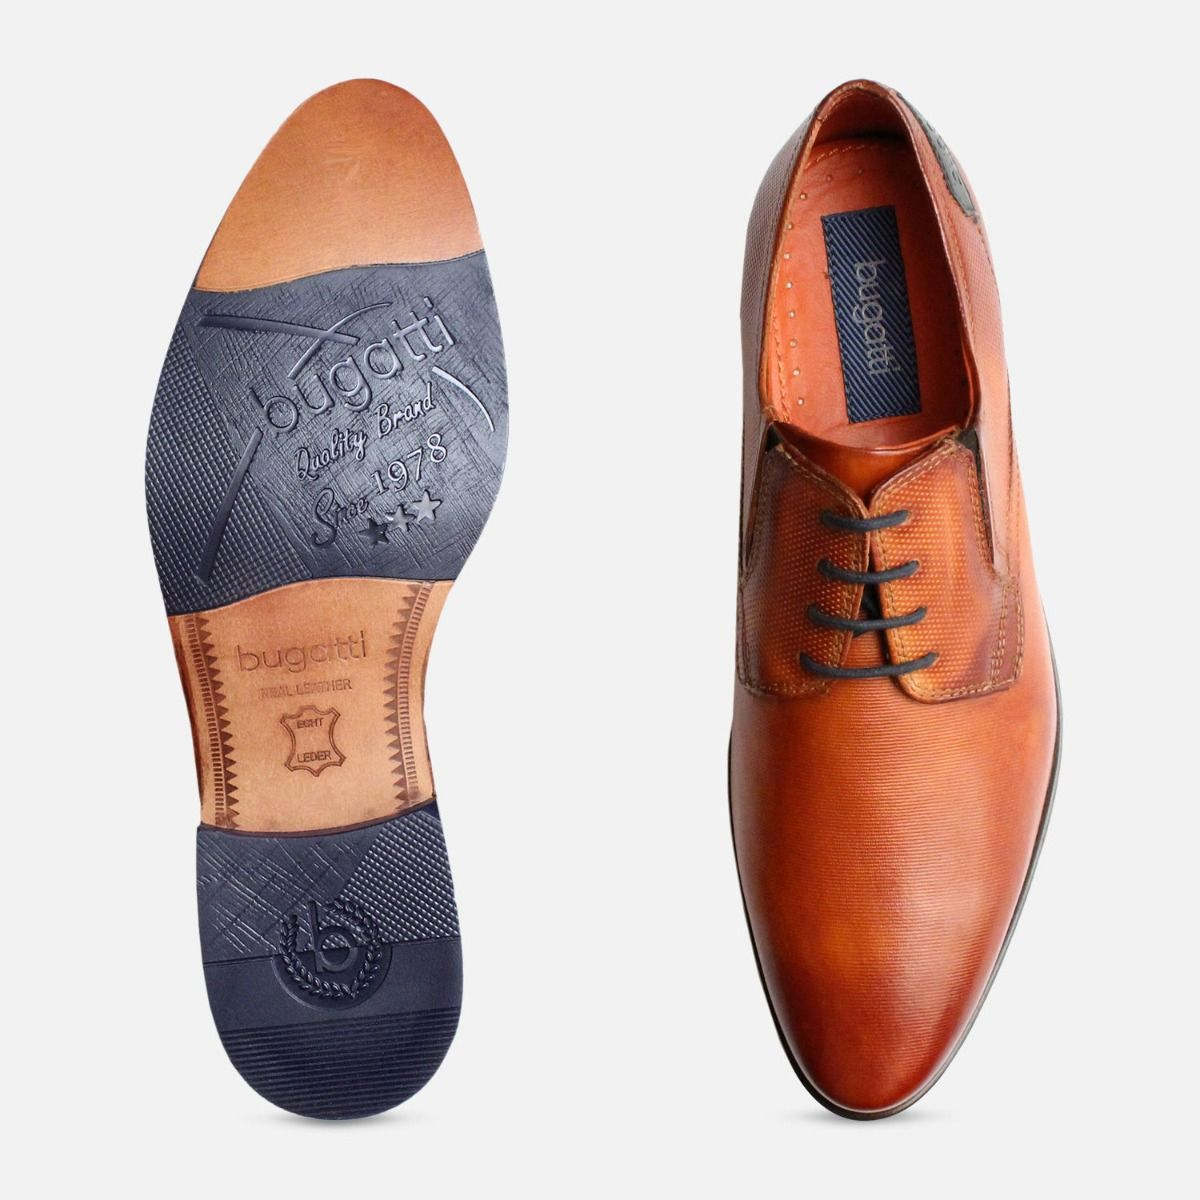 Mens Formal Pointed Bugatti Tan Shoes